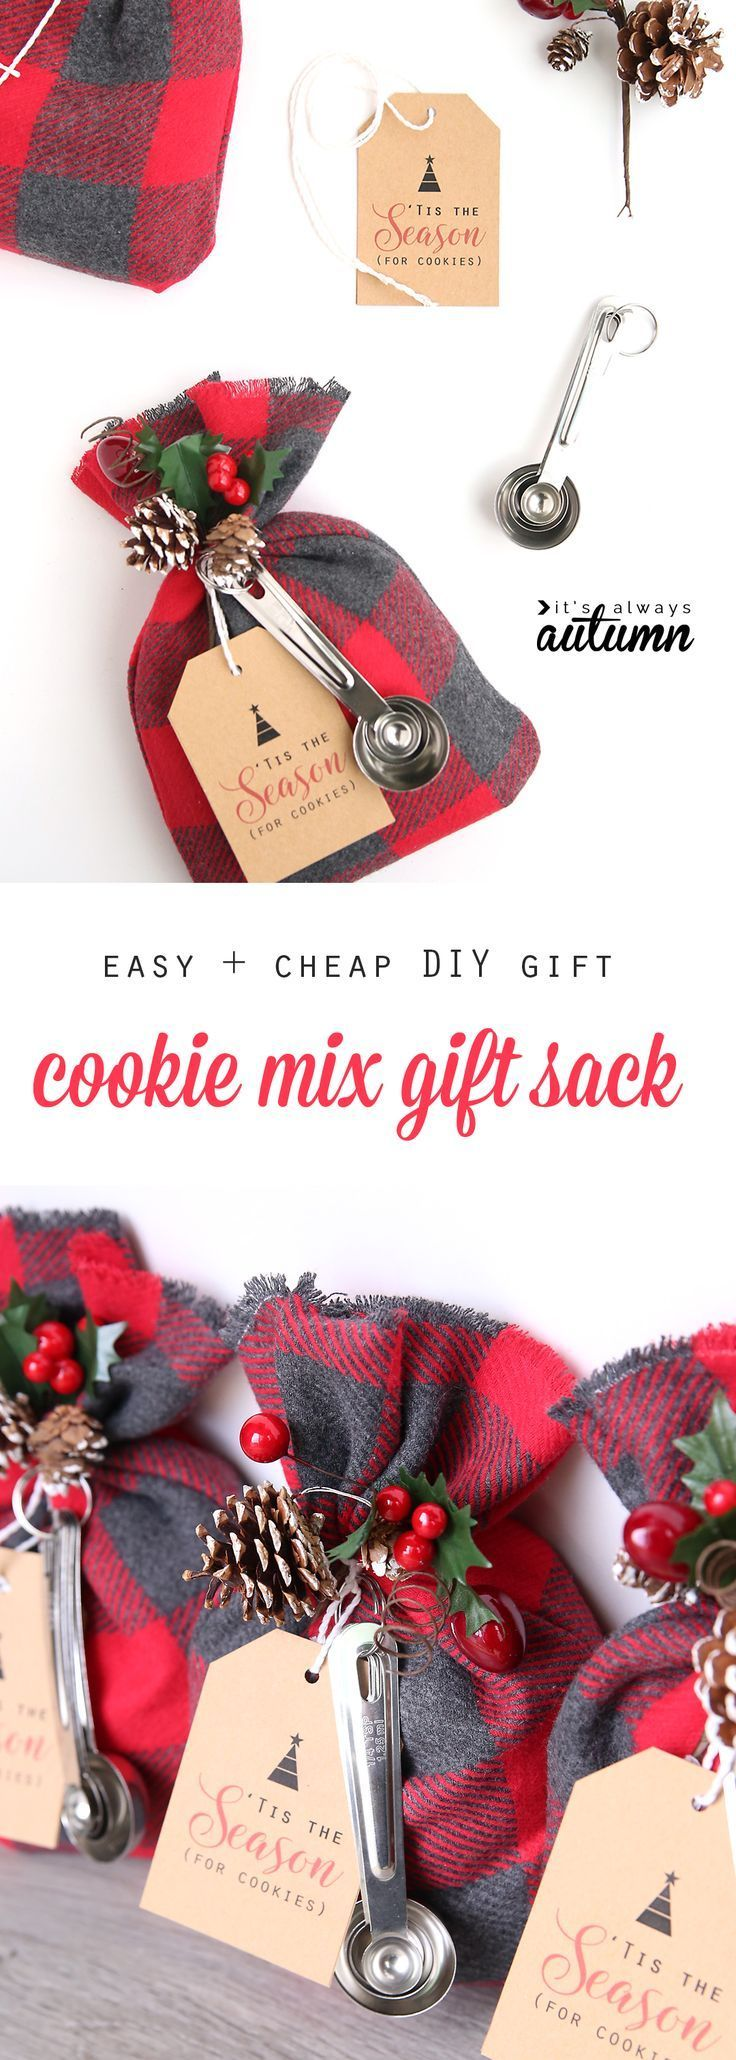 cookie mix gift sack | easy DIY Christmas gift idea - It's Always Autumn